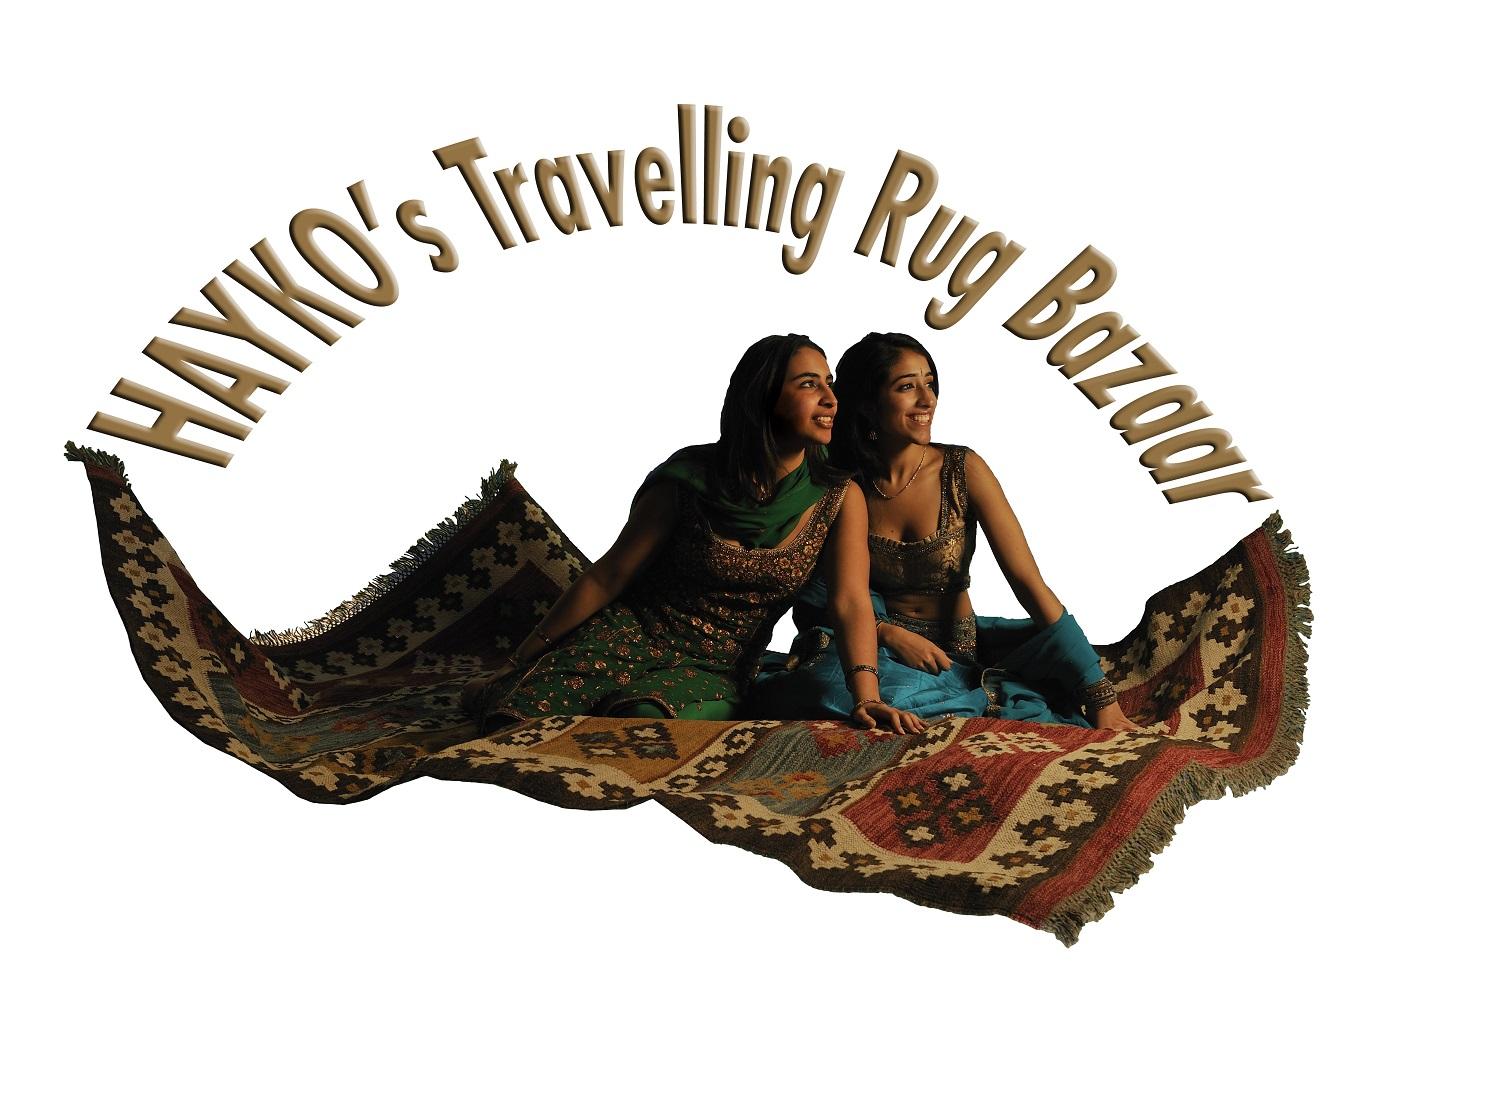 HAYKOs Travelling Rug Bazaar